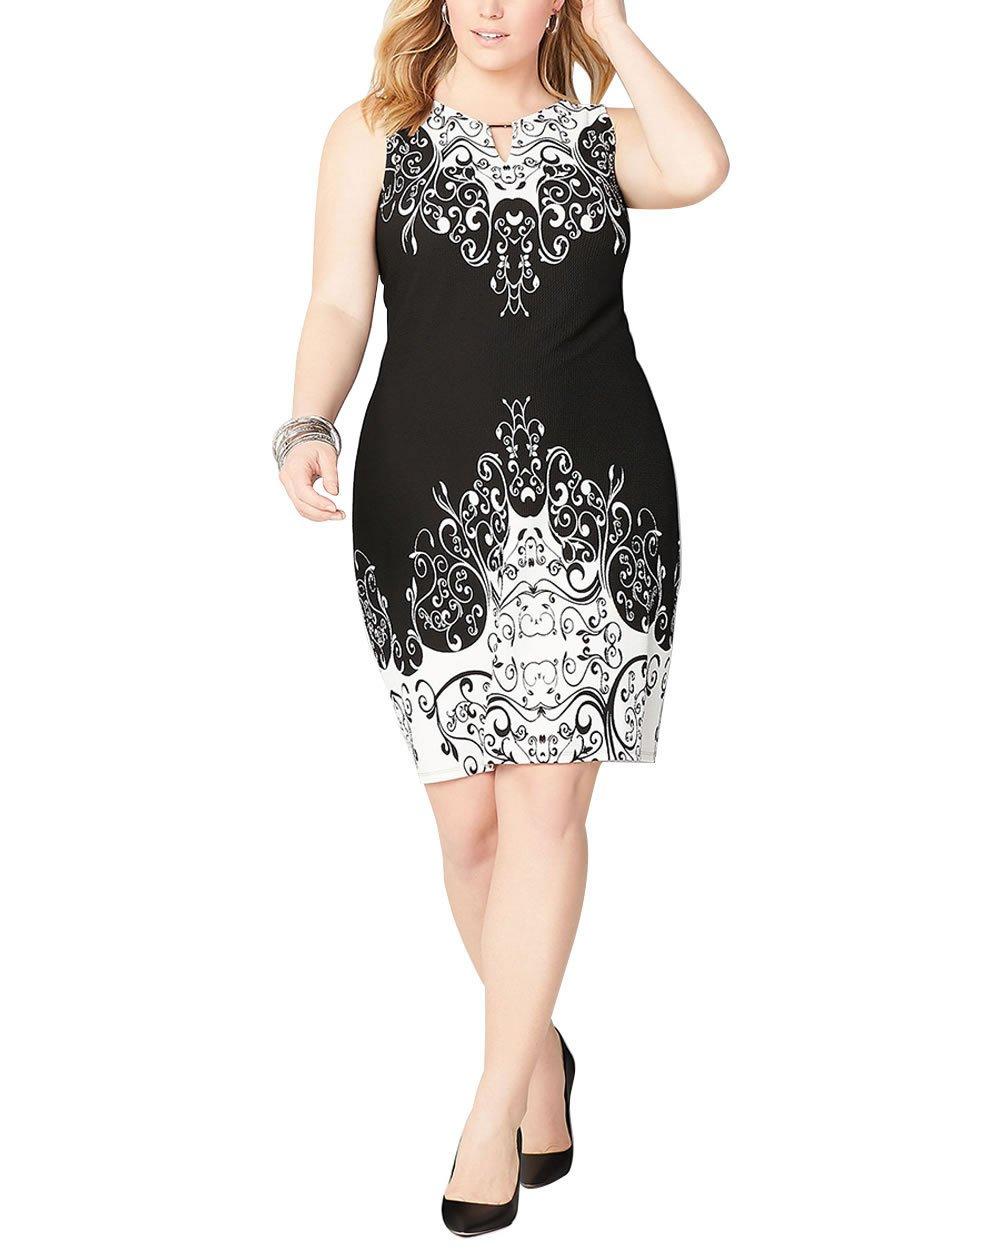 CACNCUT Women's Plus Size Dresses Sleeveless Printed Summer Dresses Office Clothing Elegant 3XL